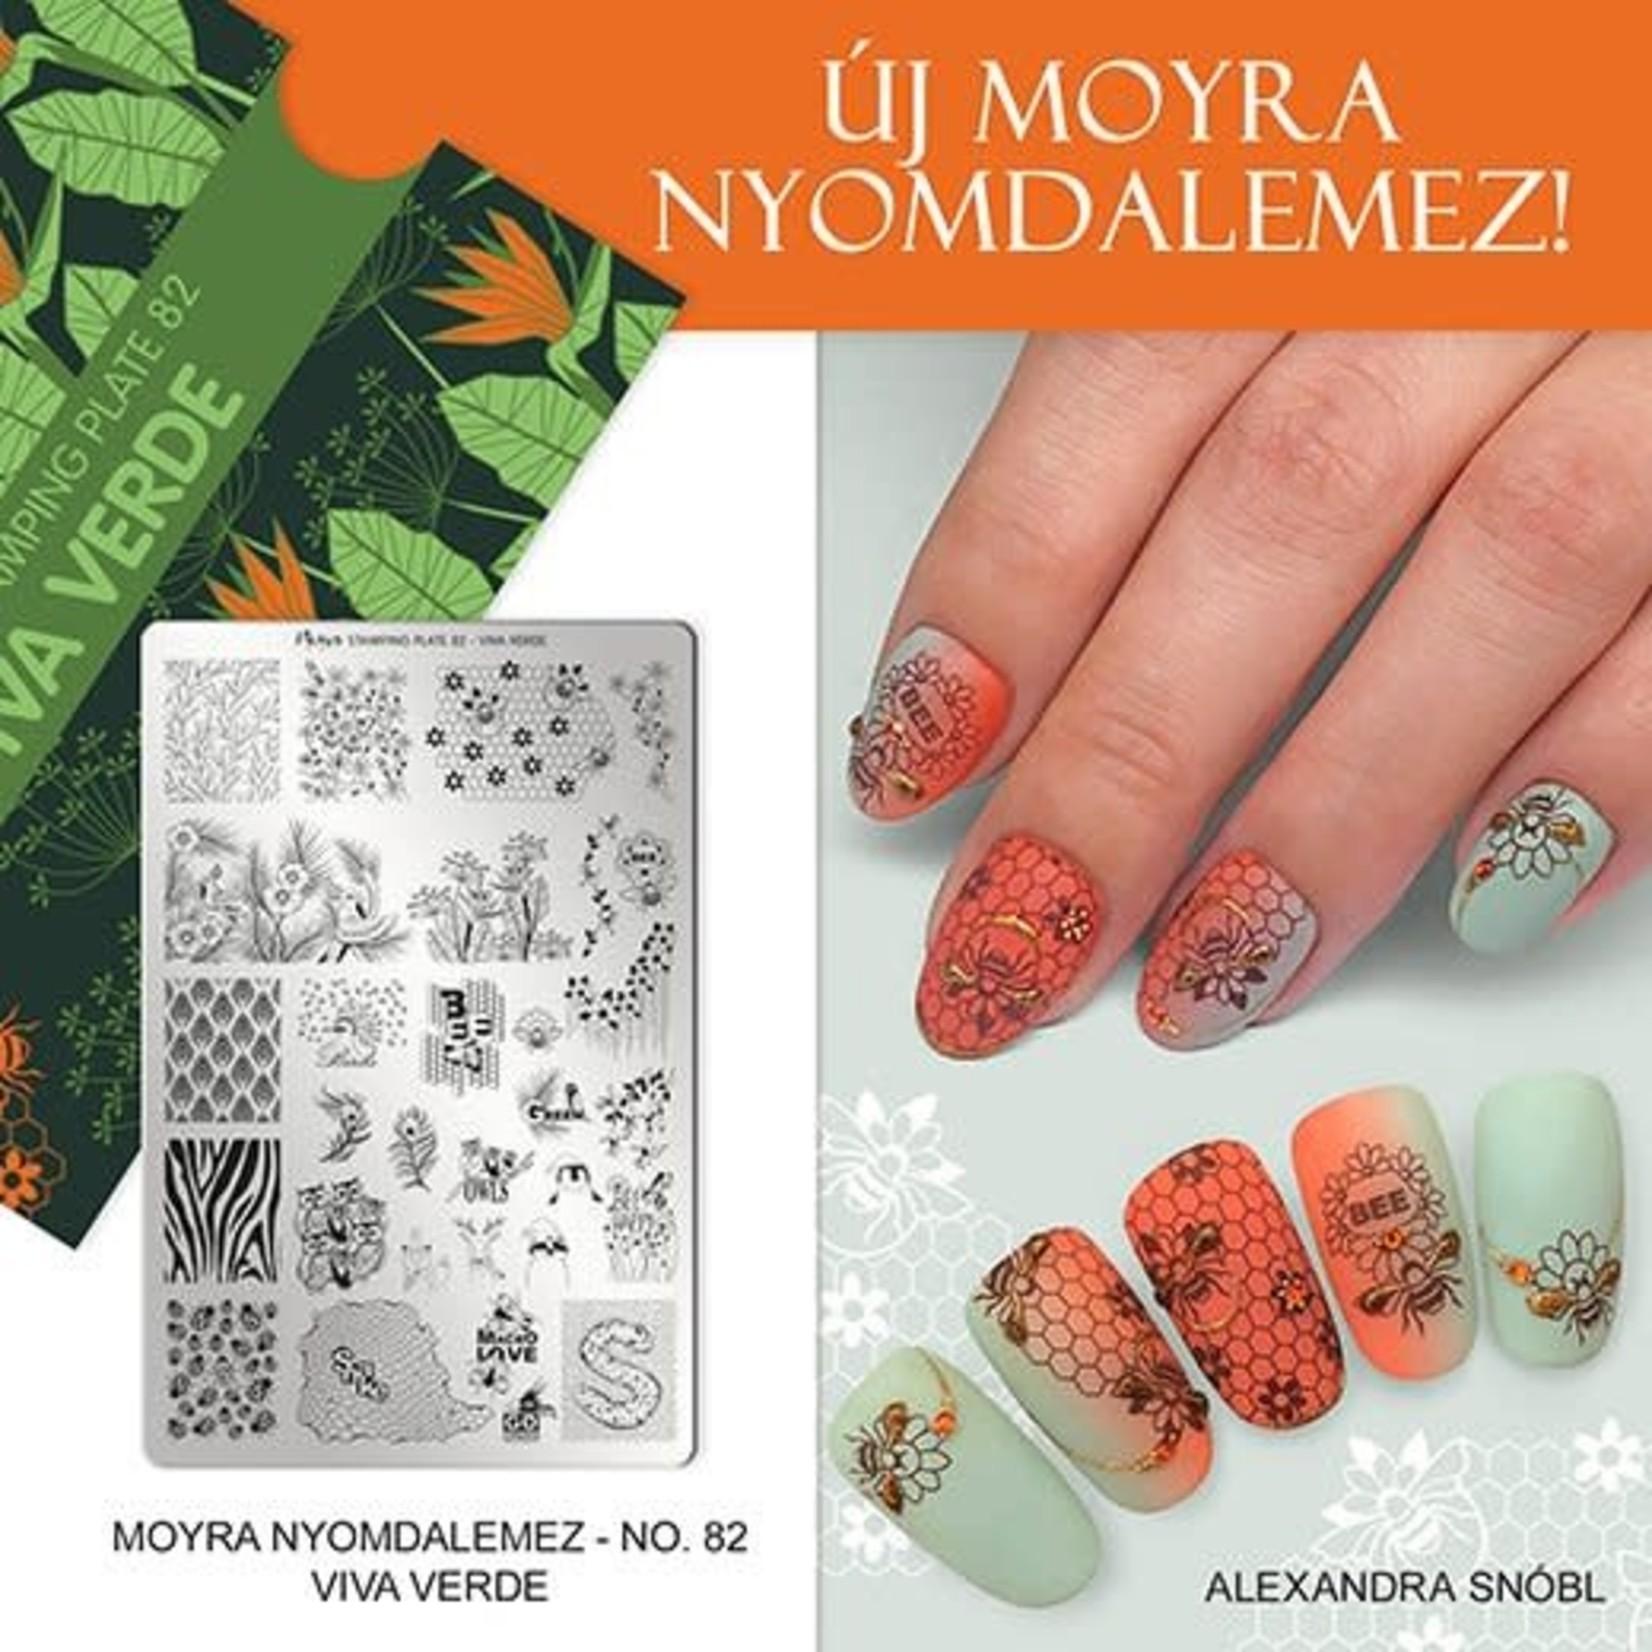 Moyra Moyra Stamping plate 82 Viva verde